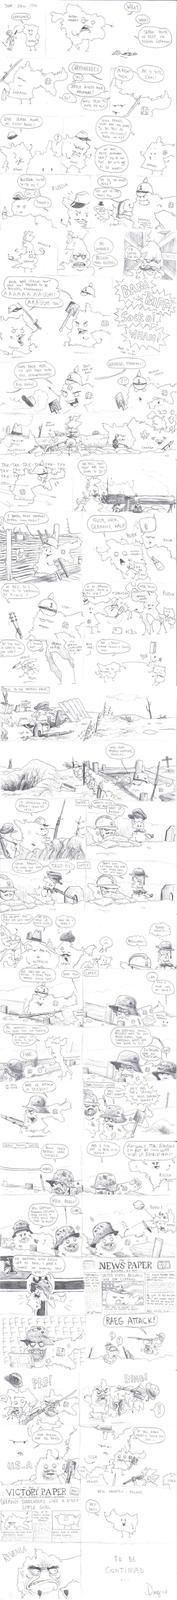 World war 1: Simplified!